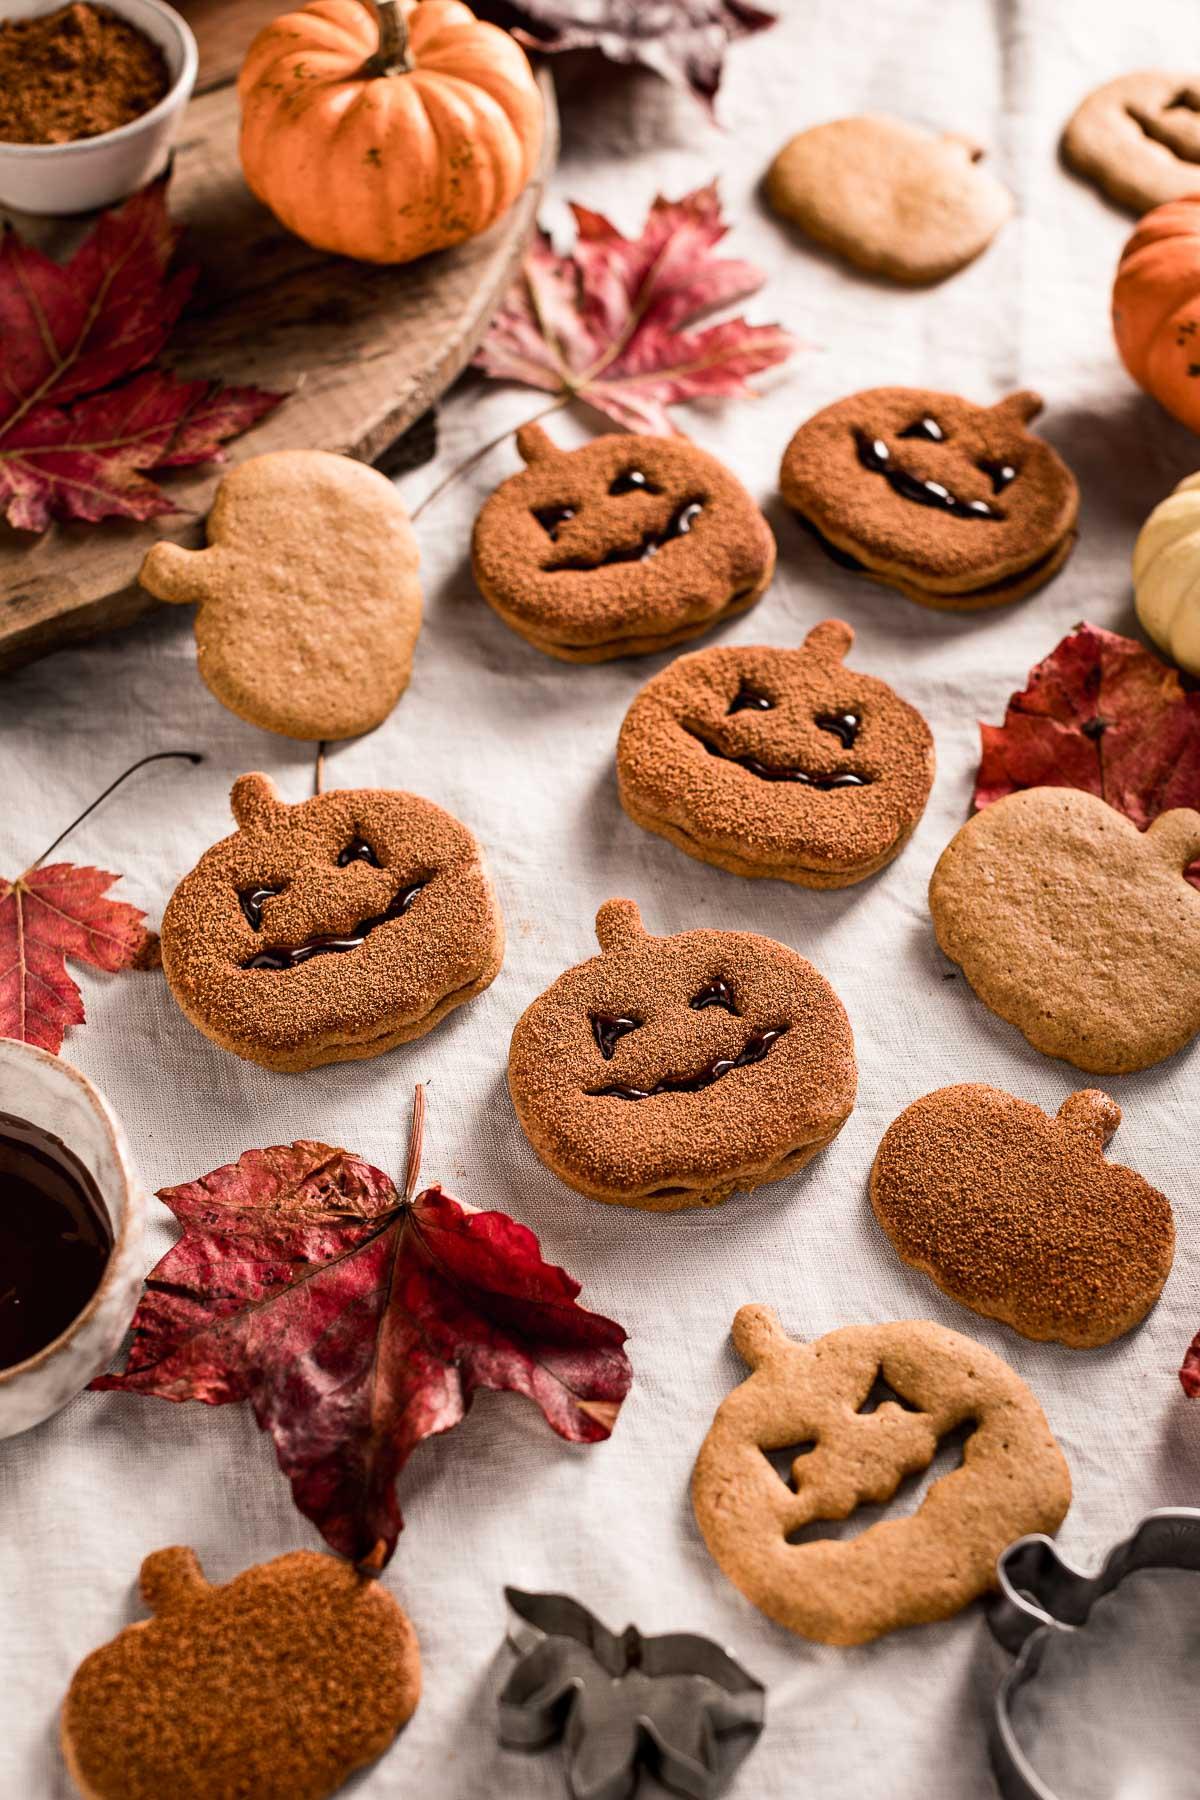 come fare i biscotti alla zucca vegan integrali senza uova senza burro frollini vegan pumpkin cutout cookies recipe Halloween cookies